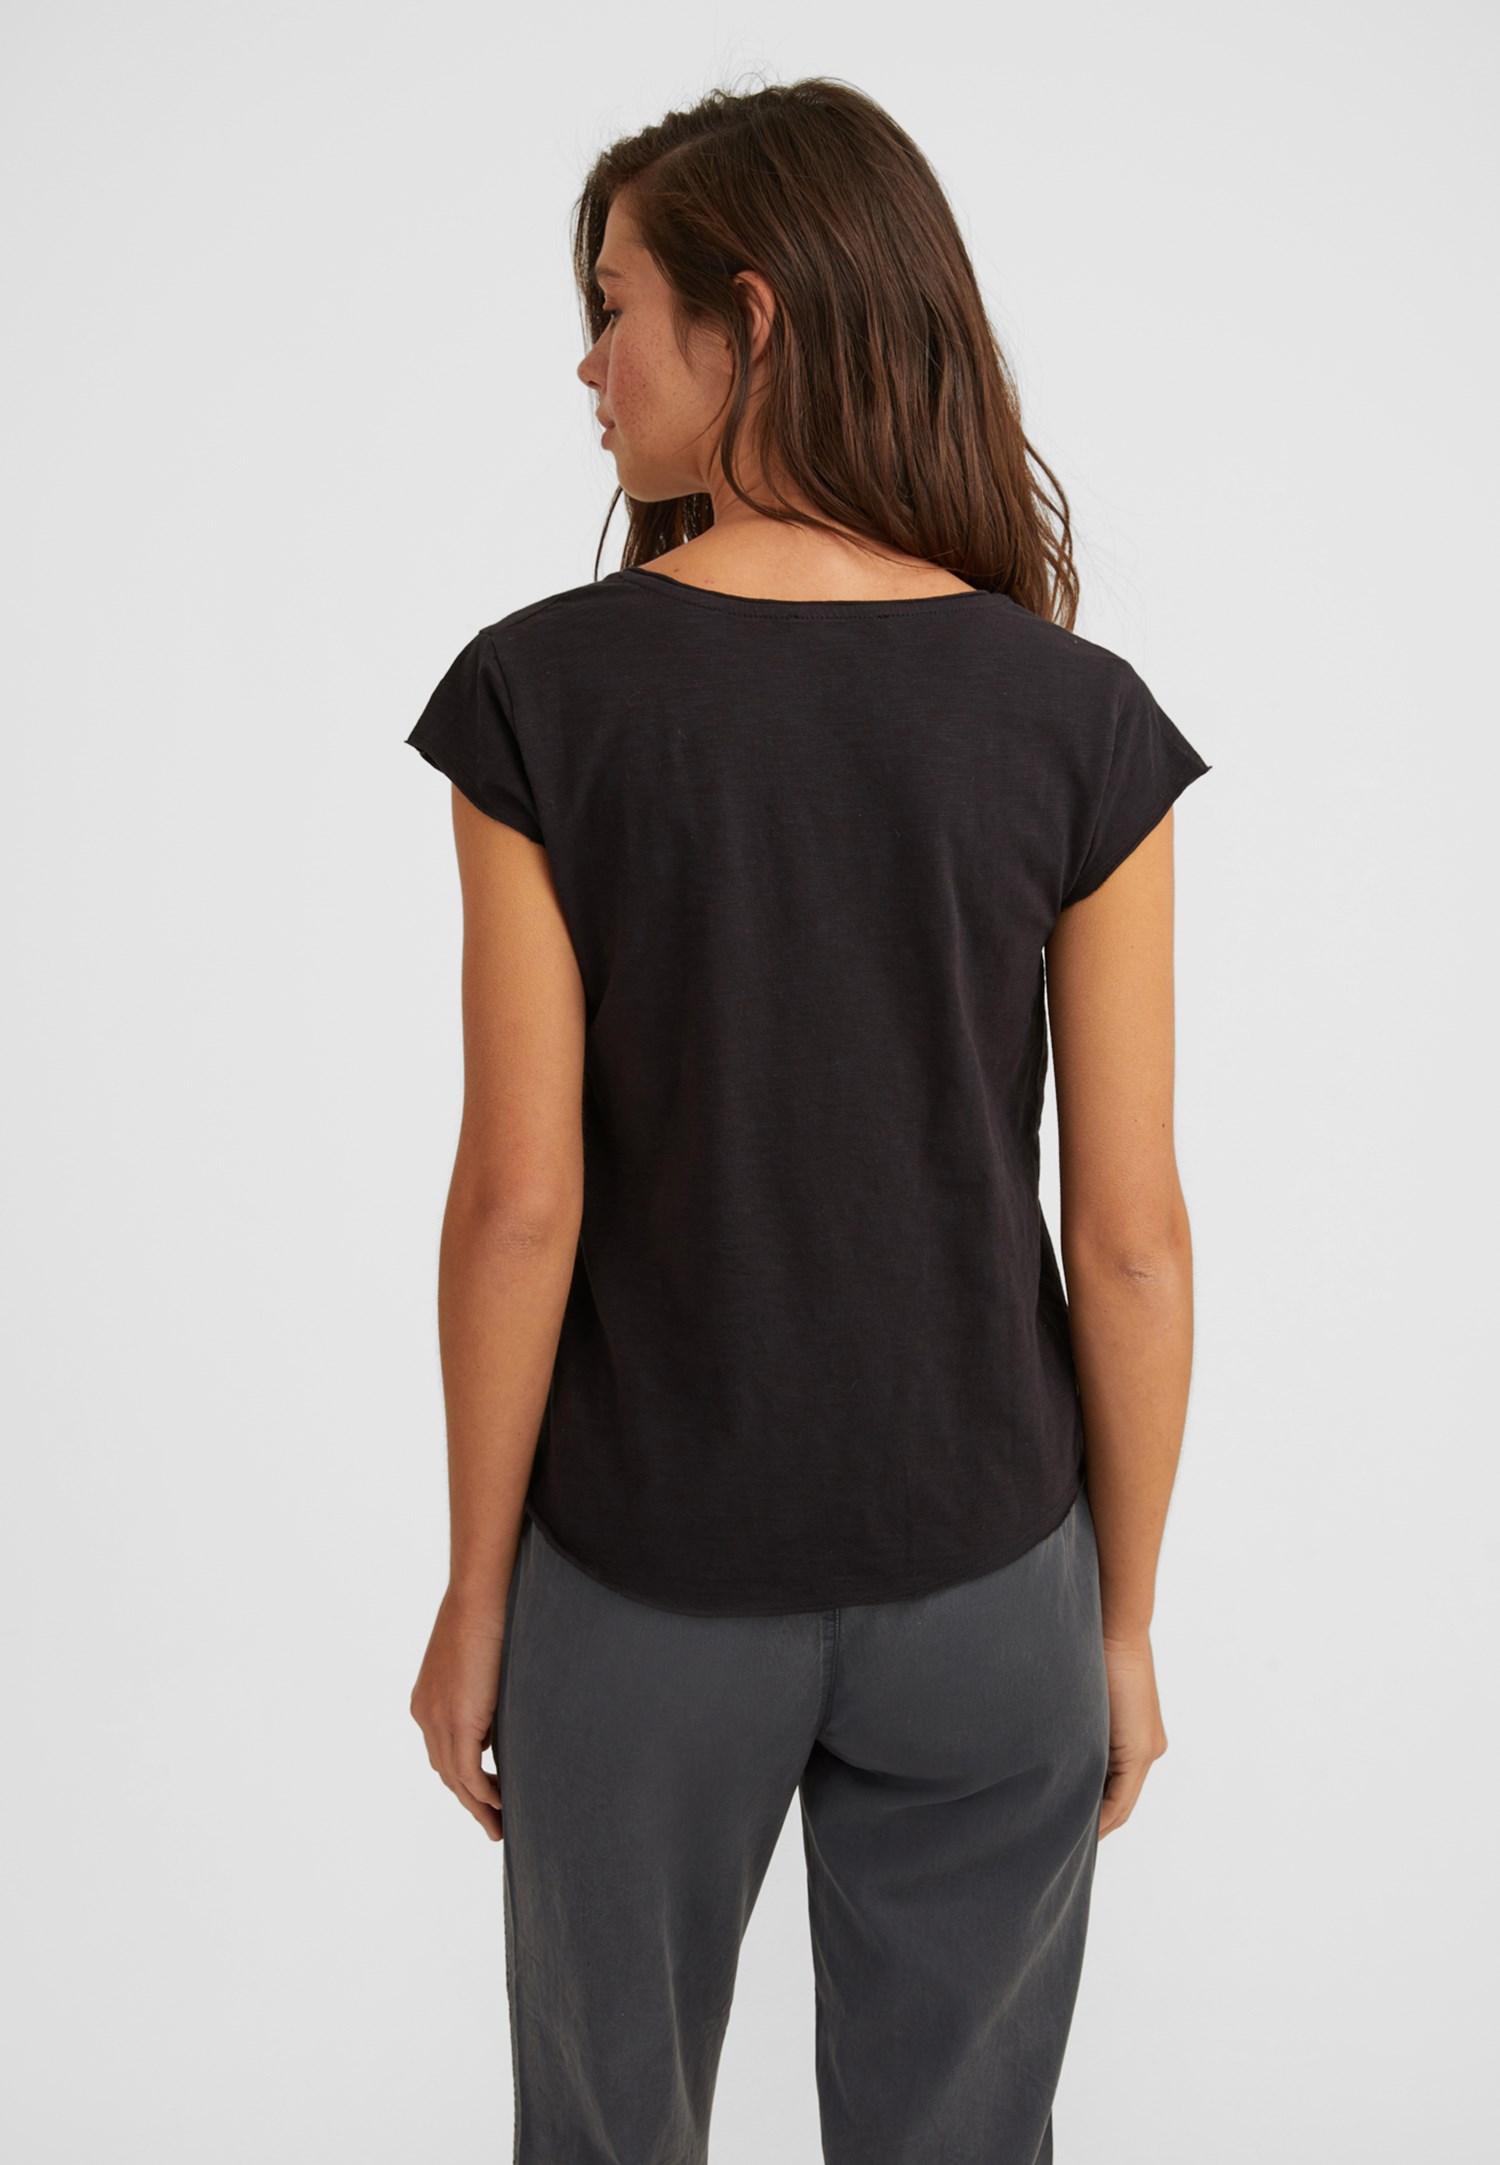 Bayan Siyah Kısa Kollu V Yaka Tişört